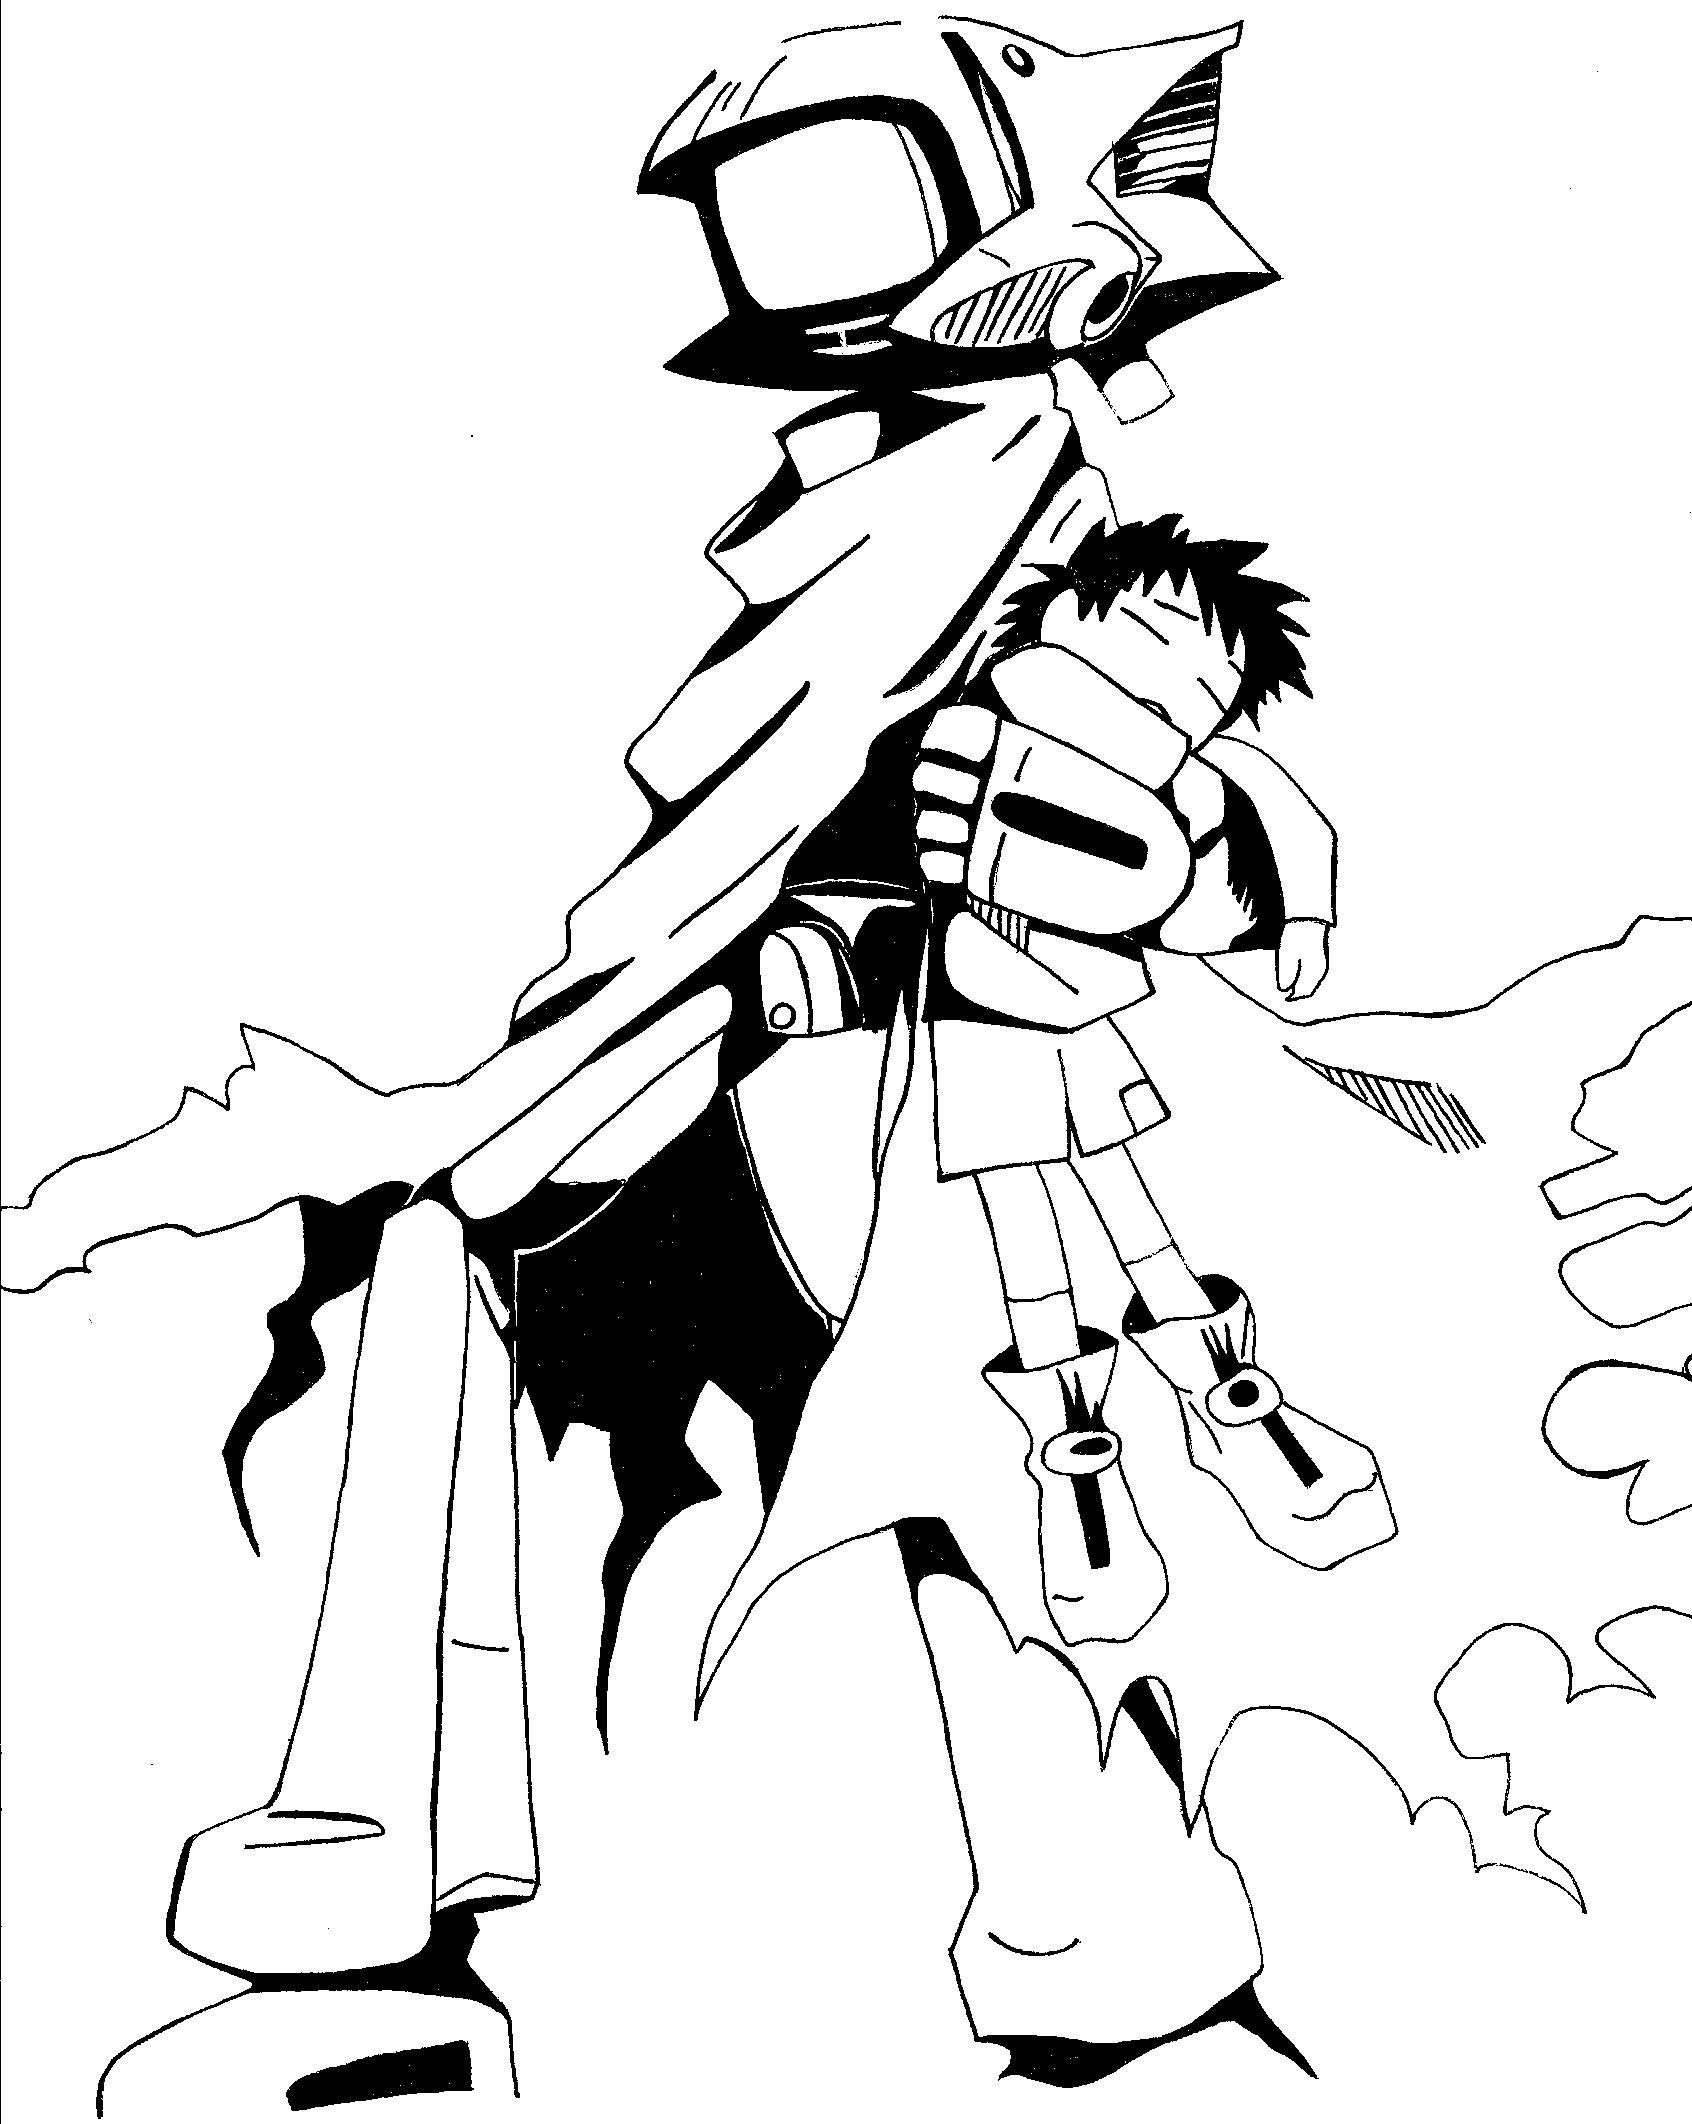 Drawn pirate pirate king On LighteningRyuYoukai by Pirate LighteningRyuYoukai